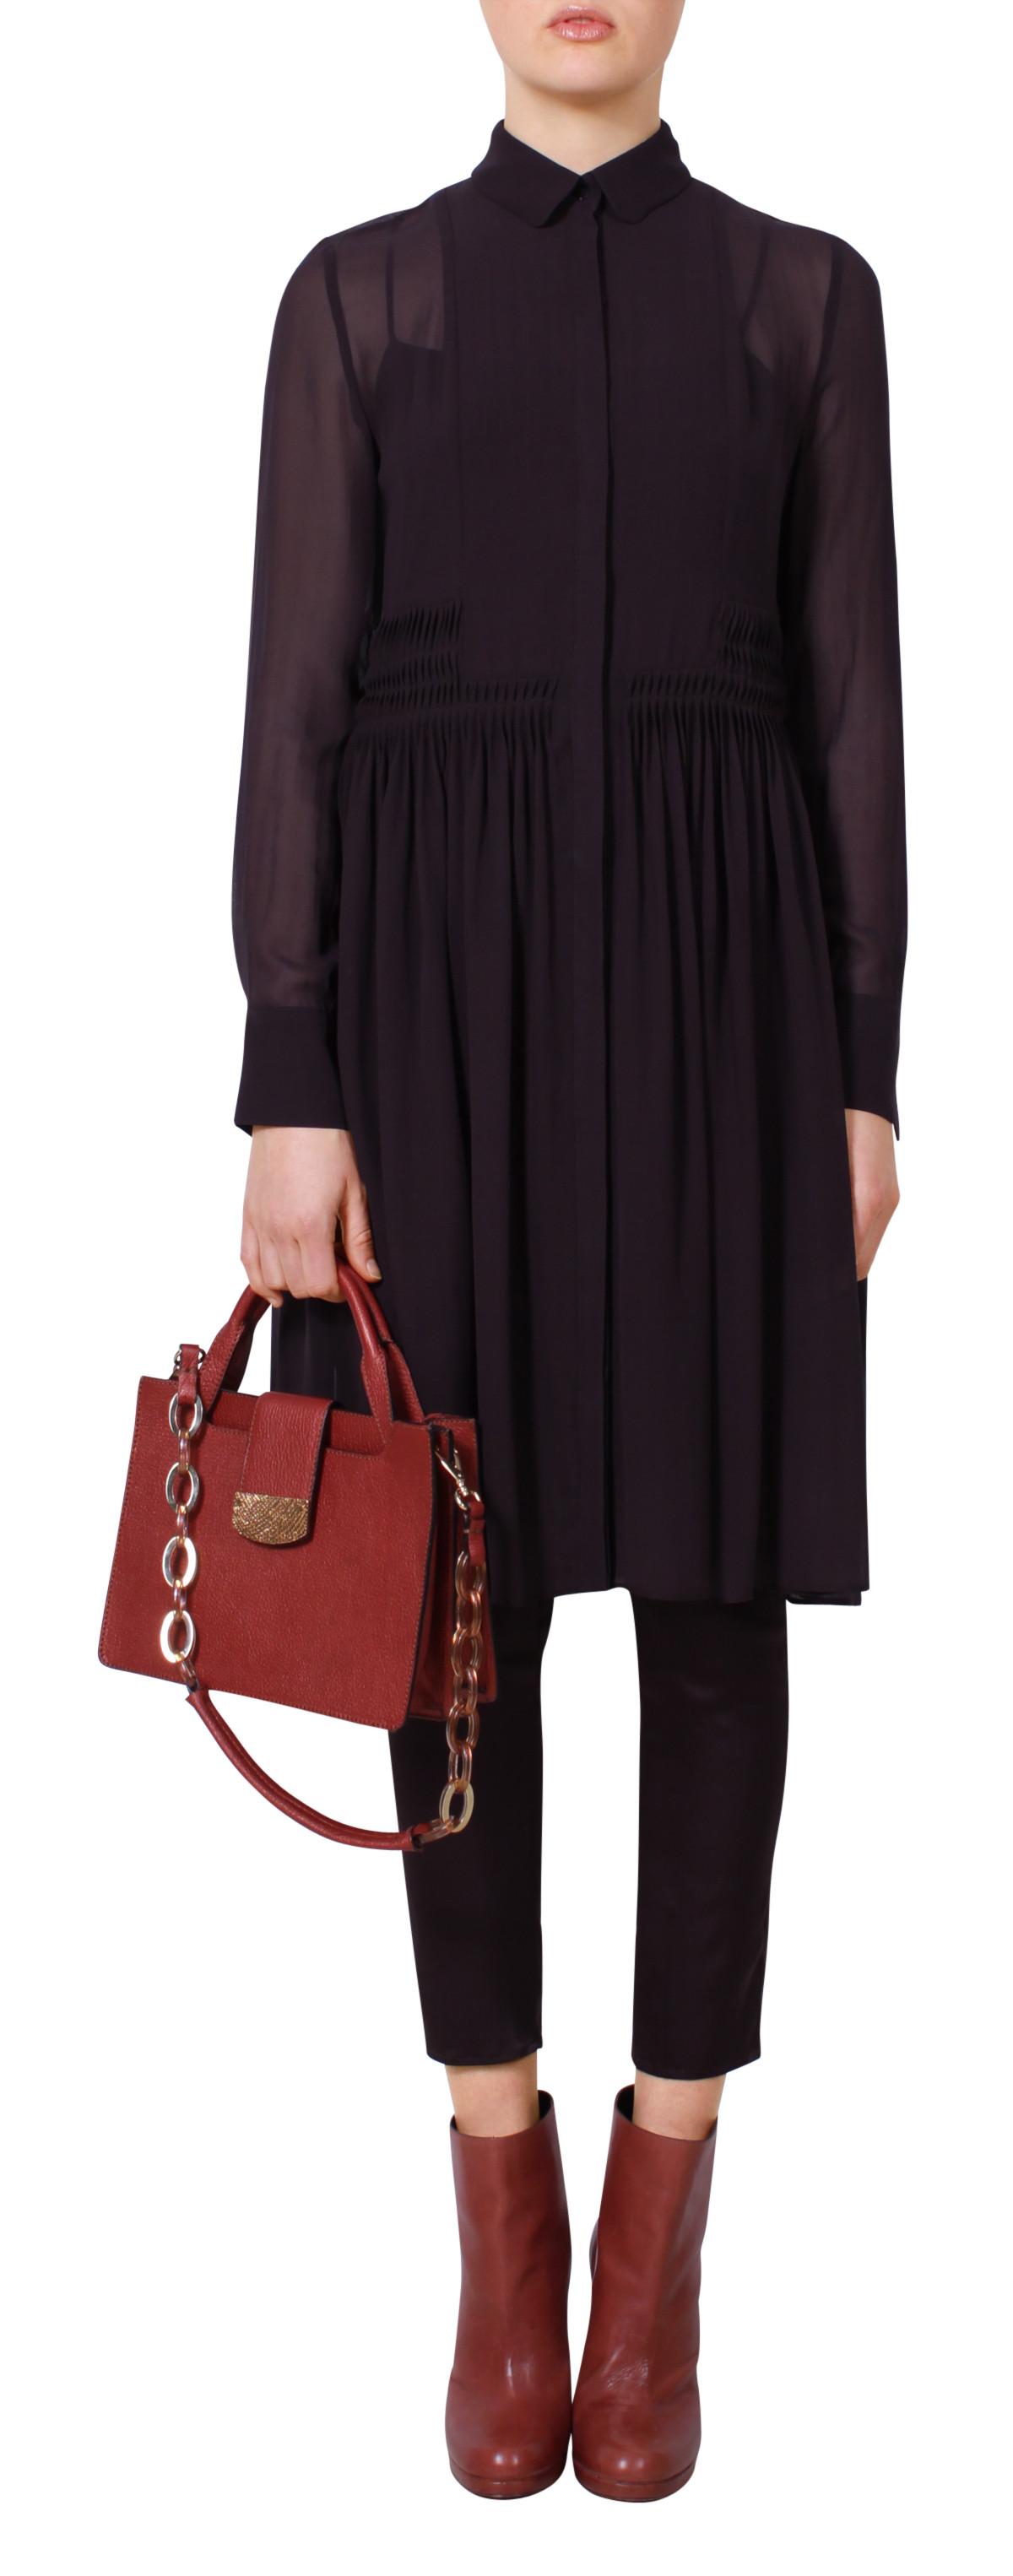 GLAZE bag  - Bags - Shop   SCHUMACHER - Onlineshop